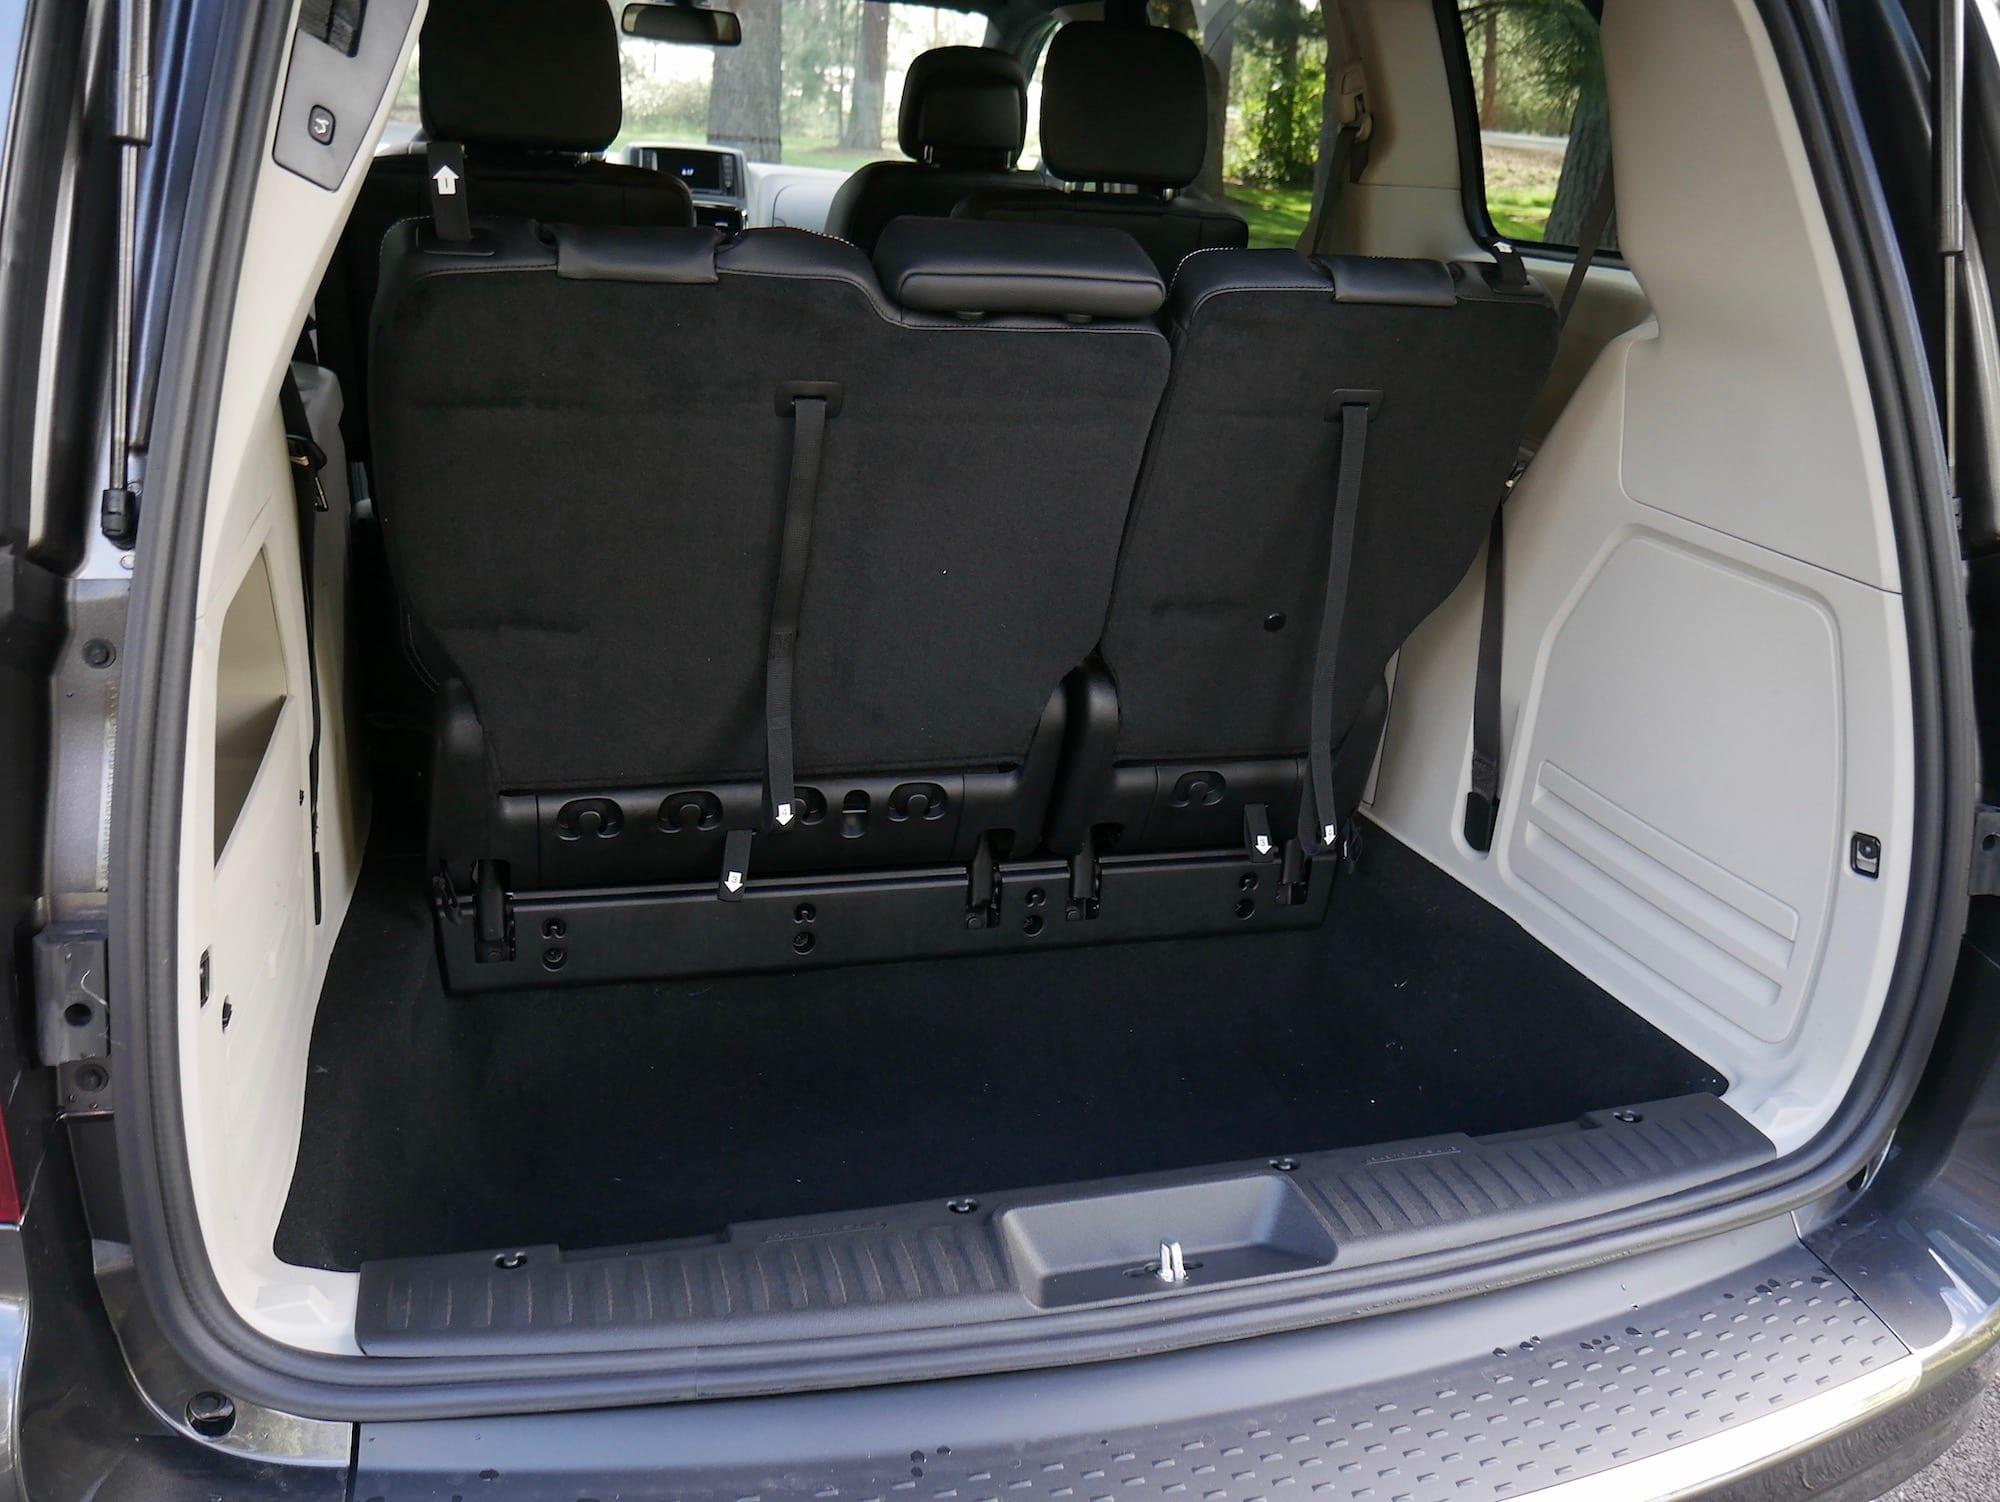 2019 Dodge Grand Caravan cargo area